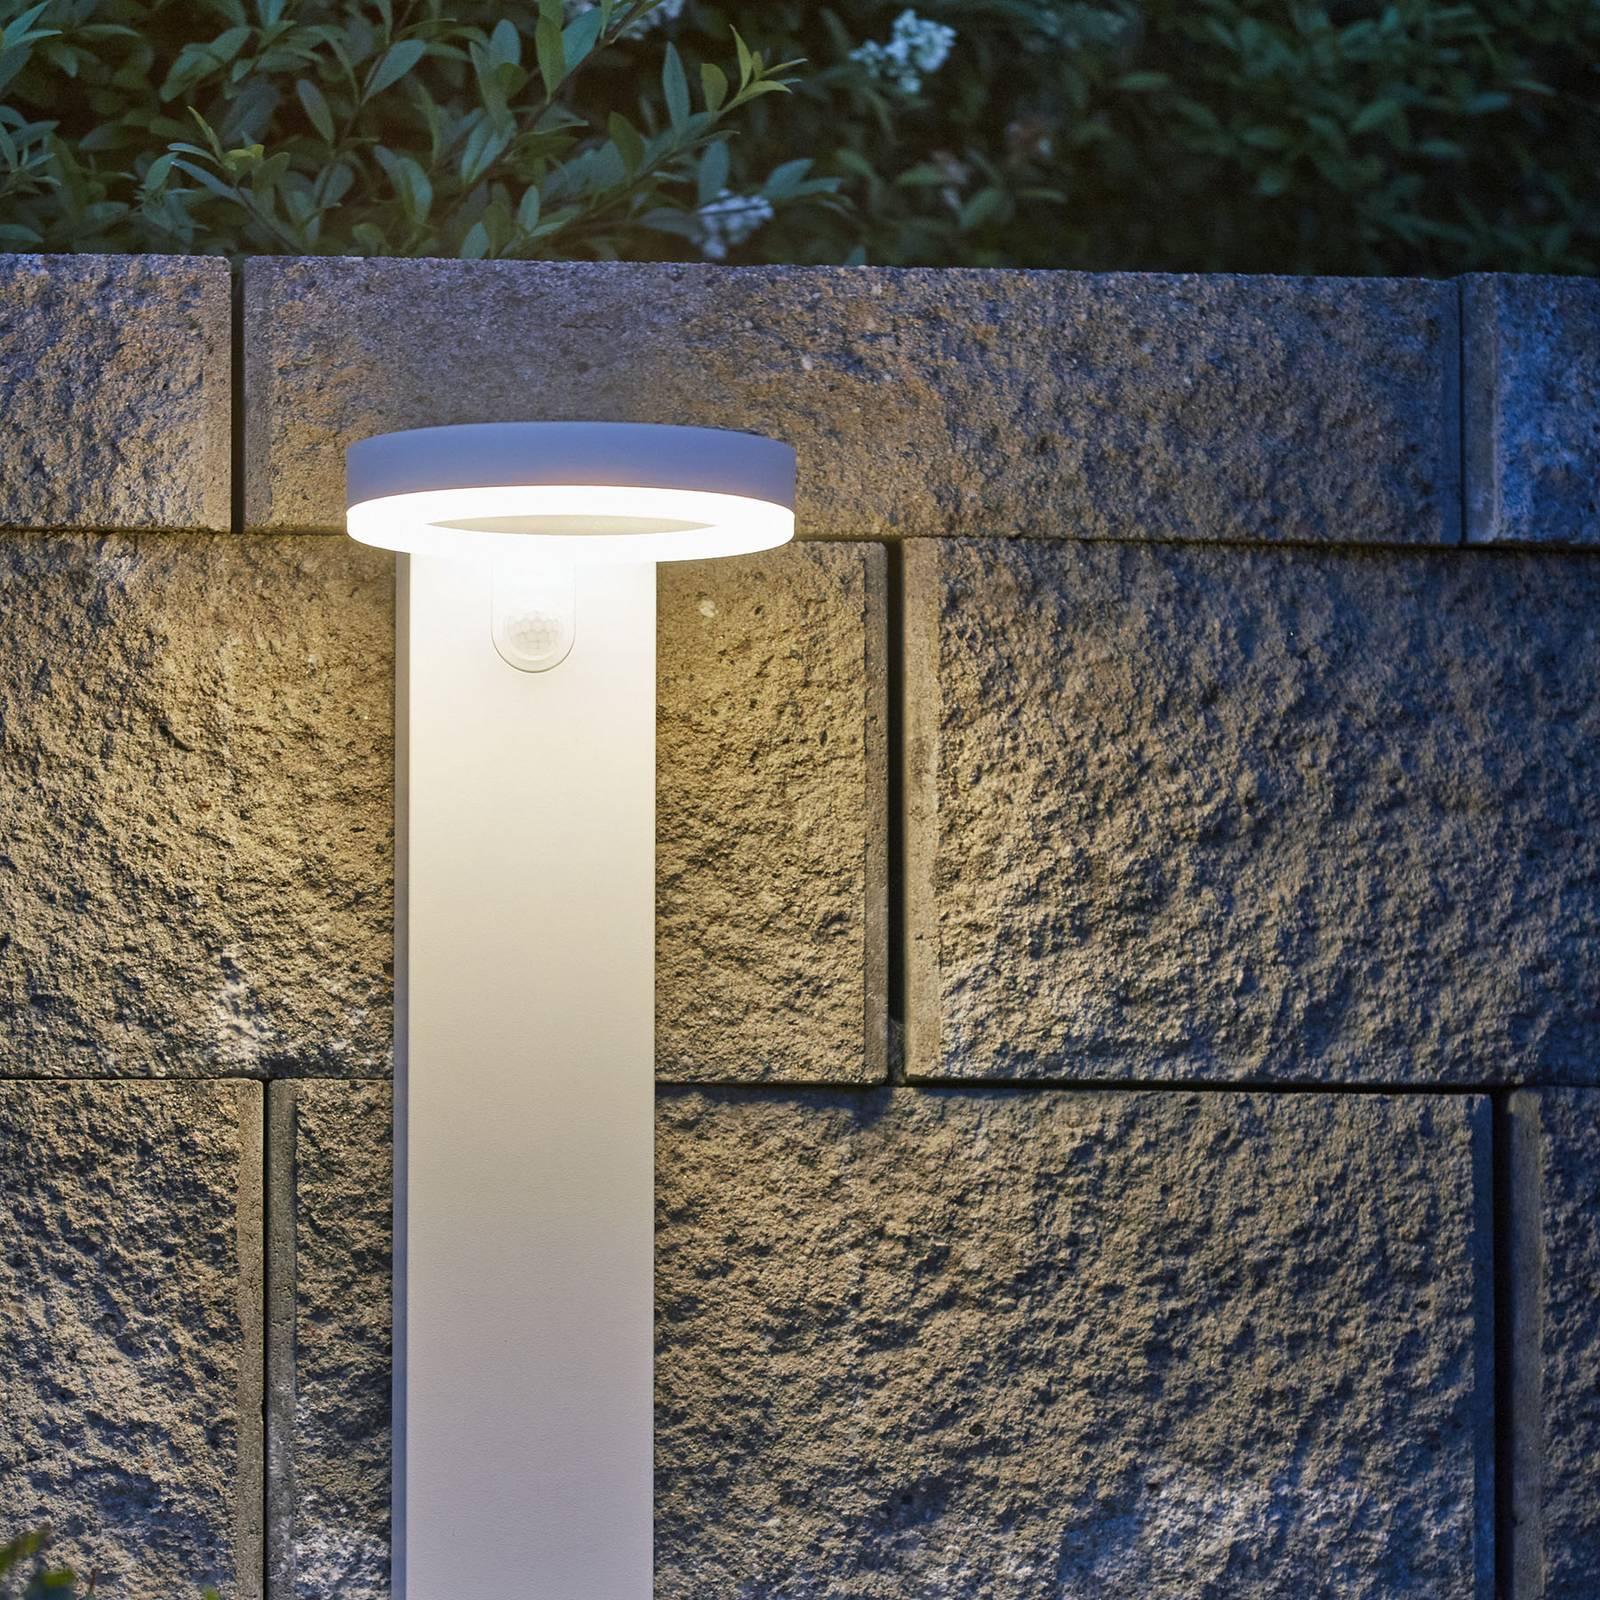 LED-aurinkopylväsvalaisin Vidi, liiketunnistin